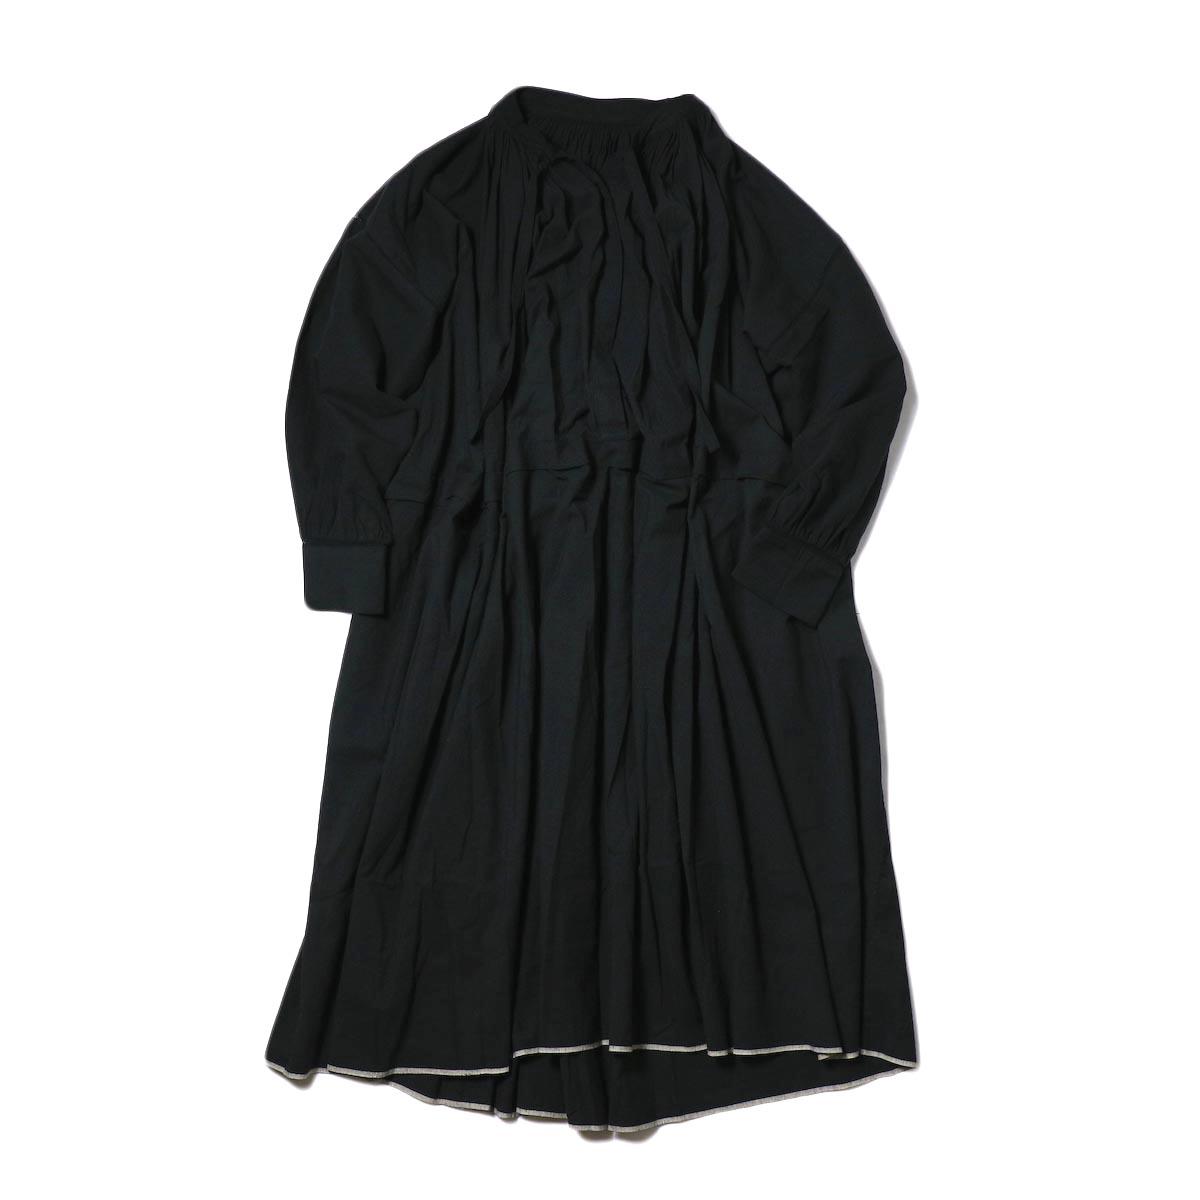 maison de soil / NECK GATHERED DRESS (black) 正面